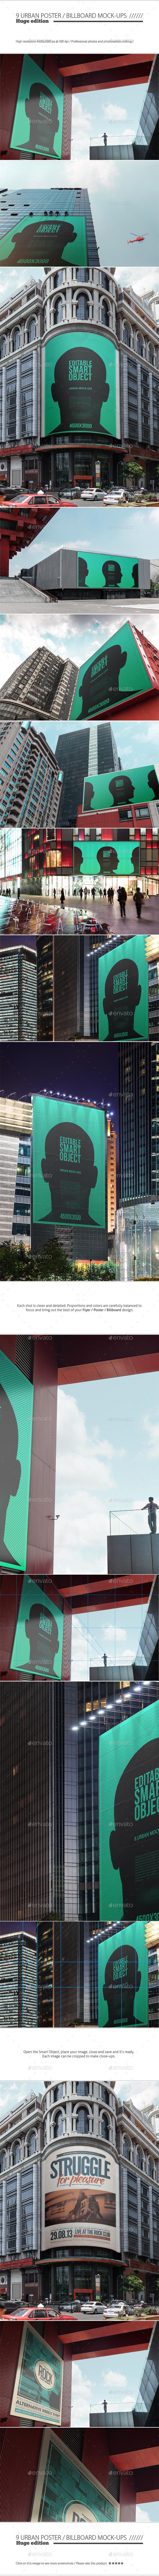 Urban Poster / Billboard Mock-ups - Huge Edition - Posters Print